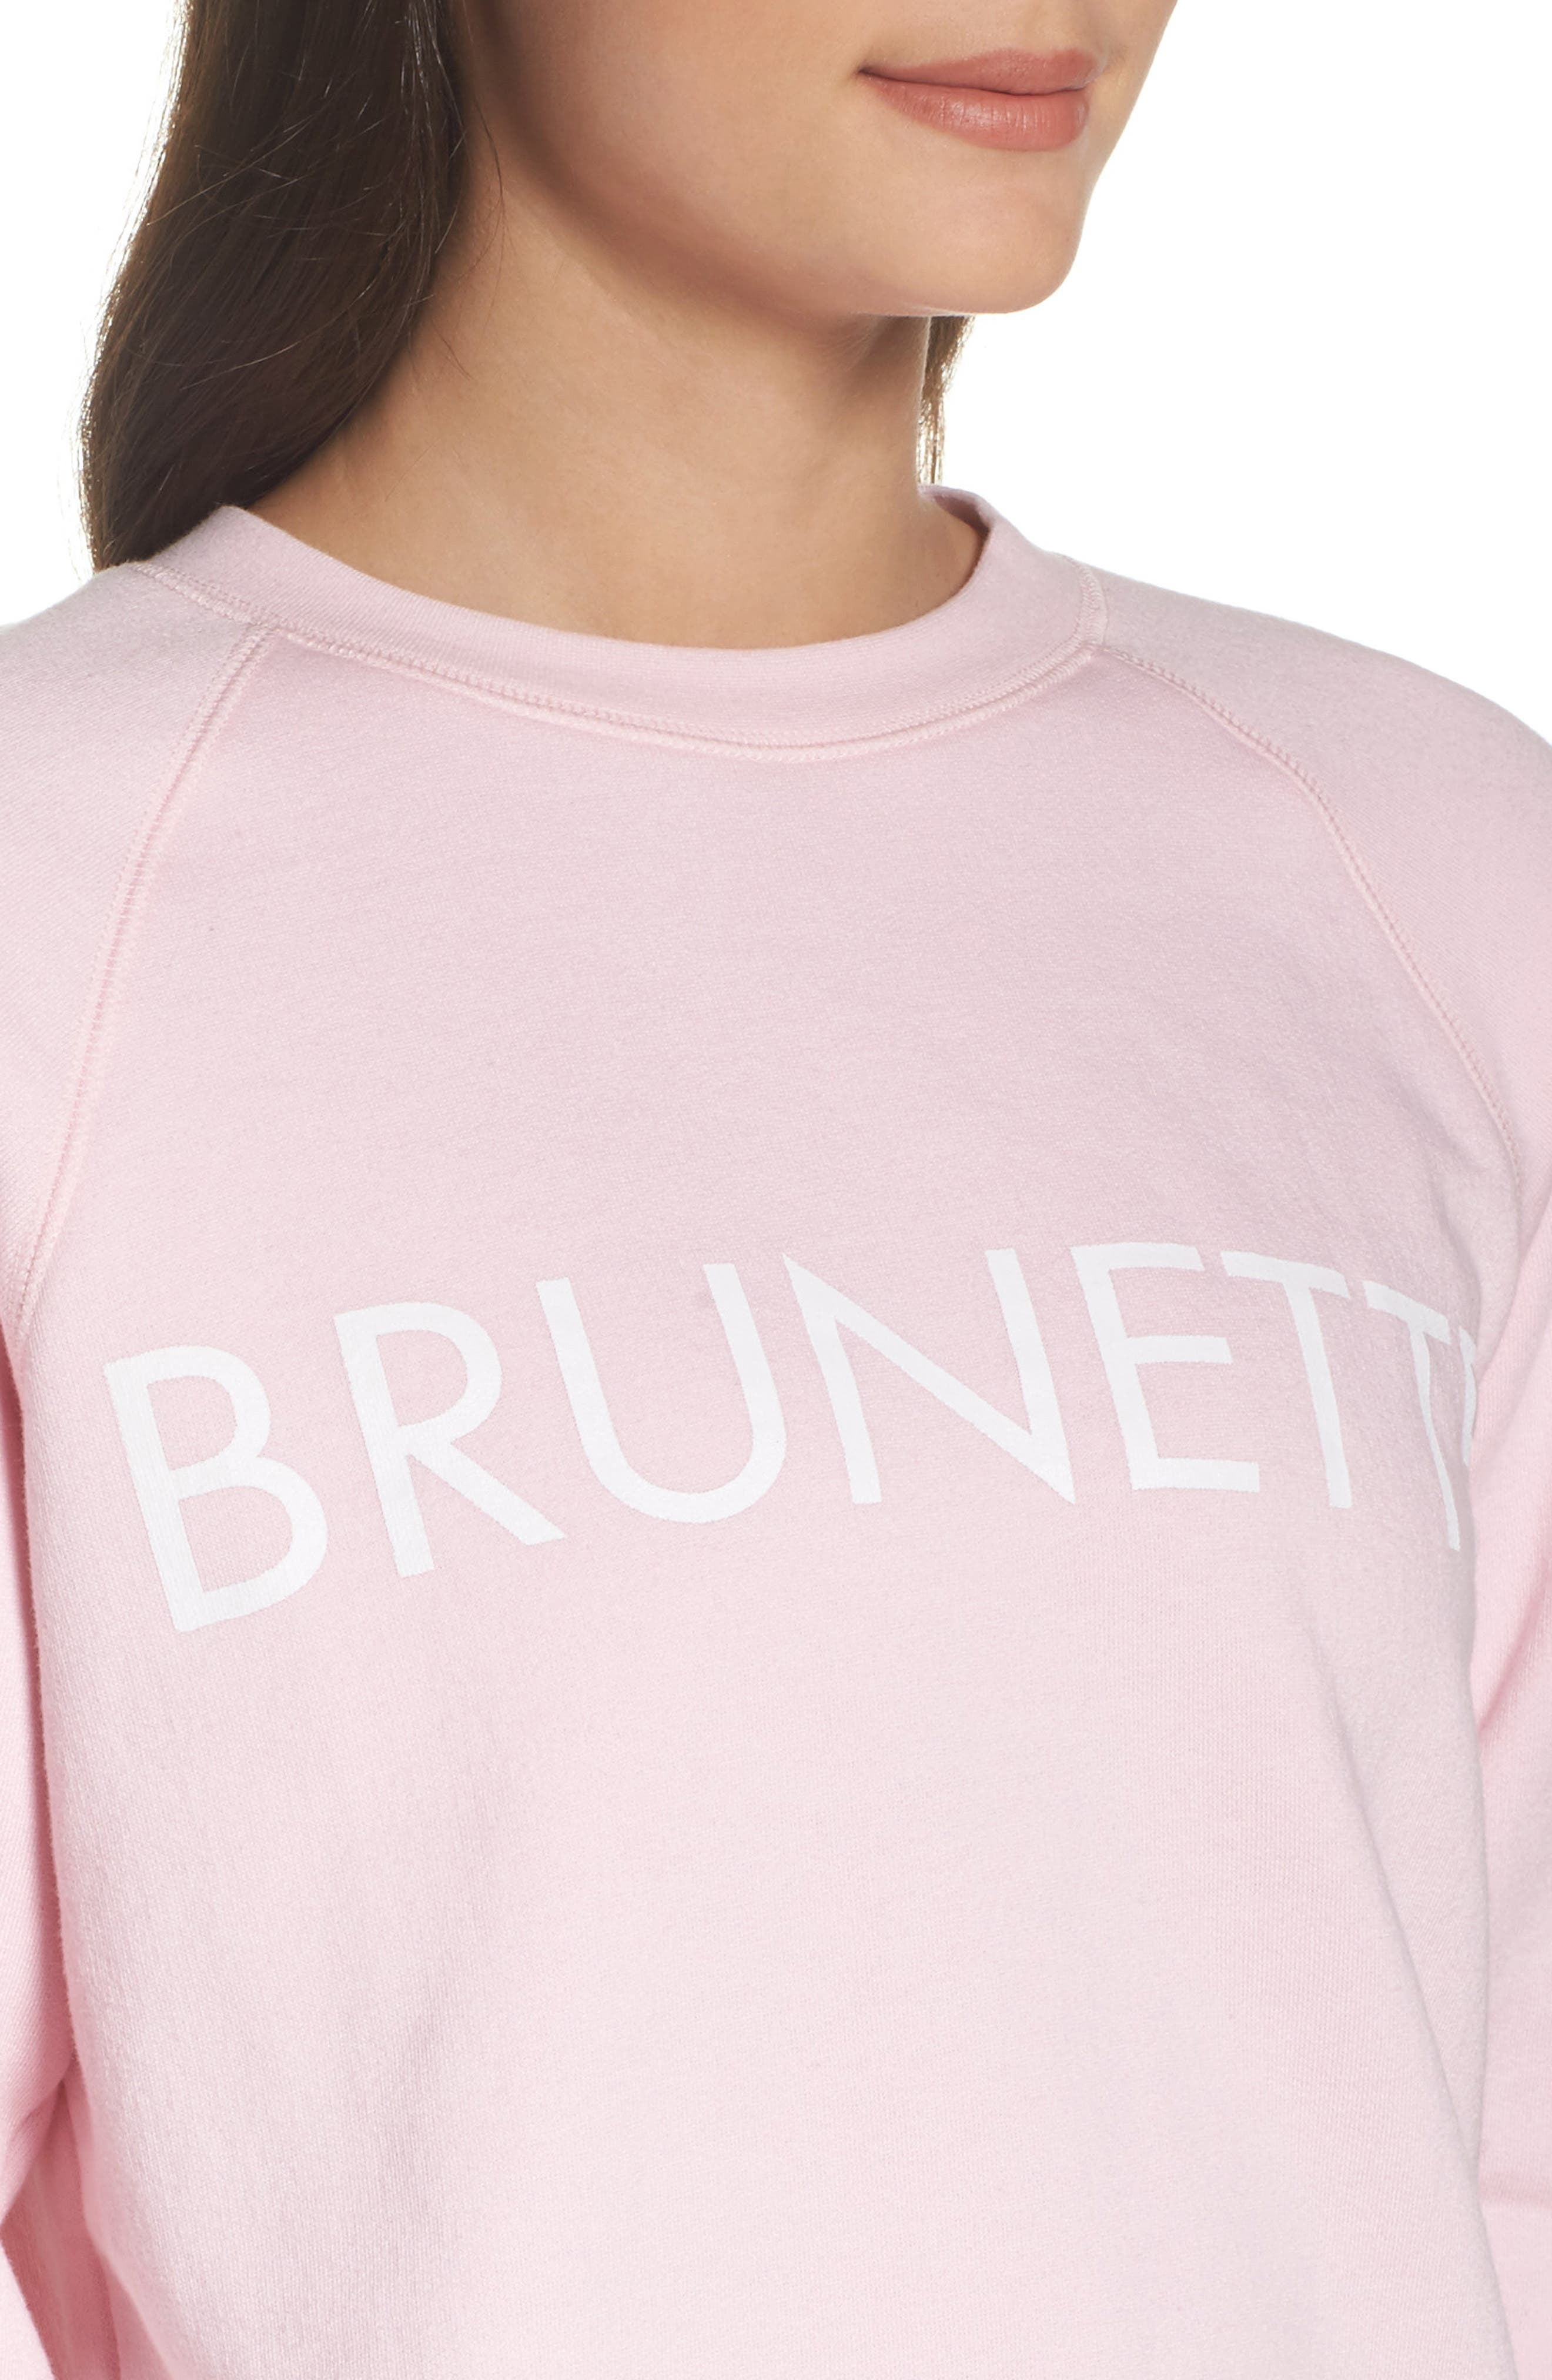 Brunette Crewneck Sweatshirt,                             Alternate thumbnail 6, color,                             Pink